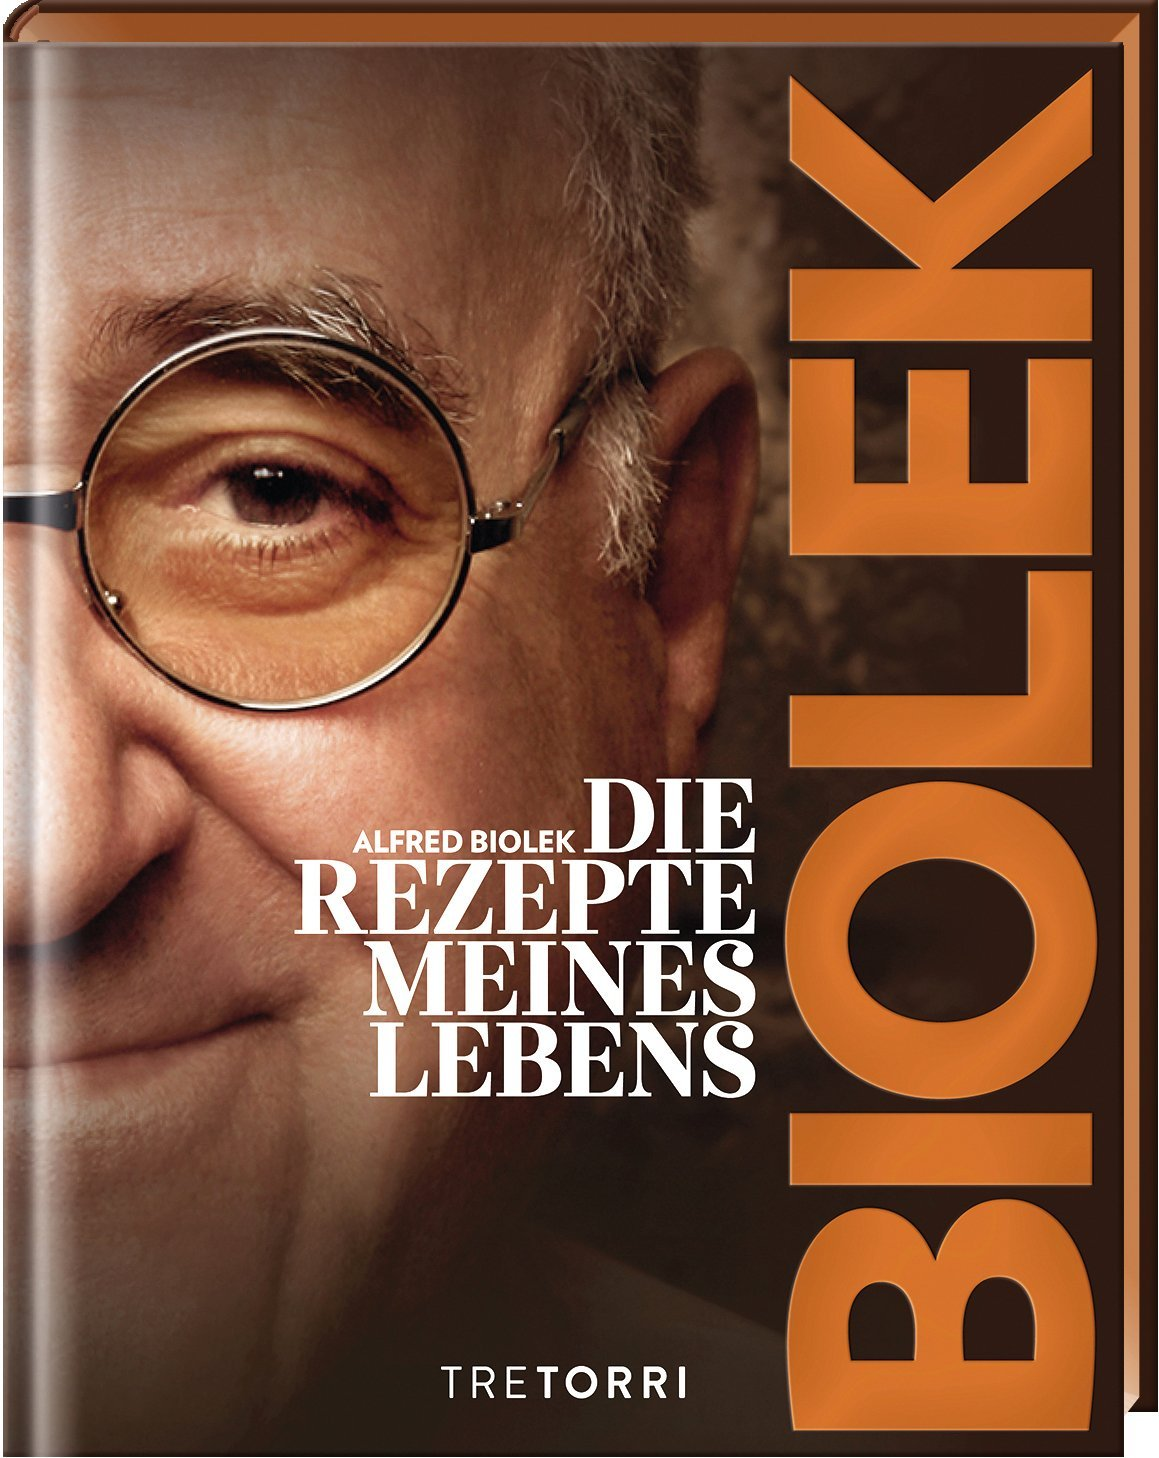 Biolek: Die Rezepte meines Lebens Gebundenes Buch – 8. September 2018 Ralf Frenzel Alfred Biolek Tre Torri Verlag 3960330472